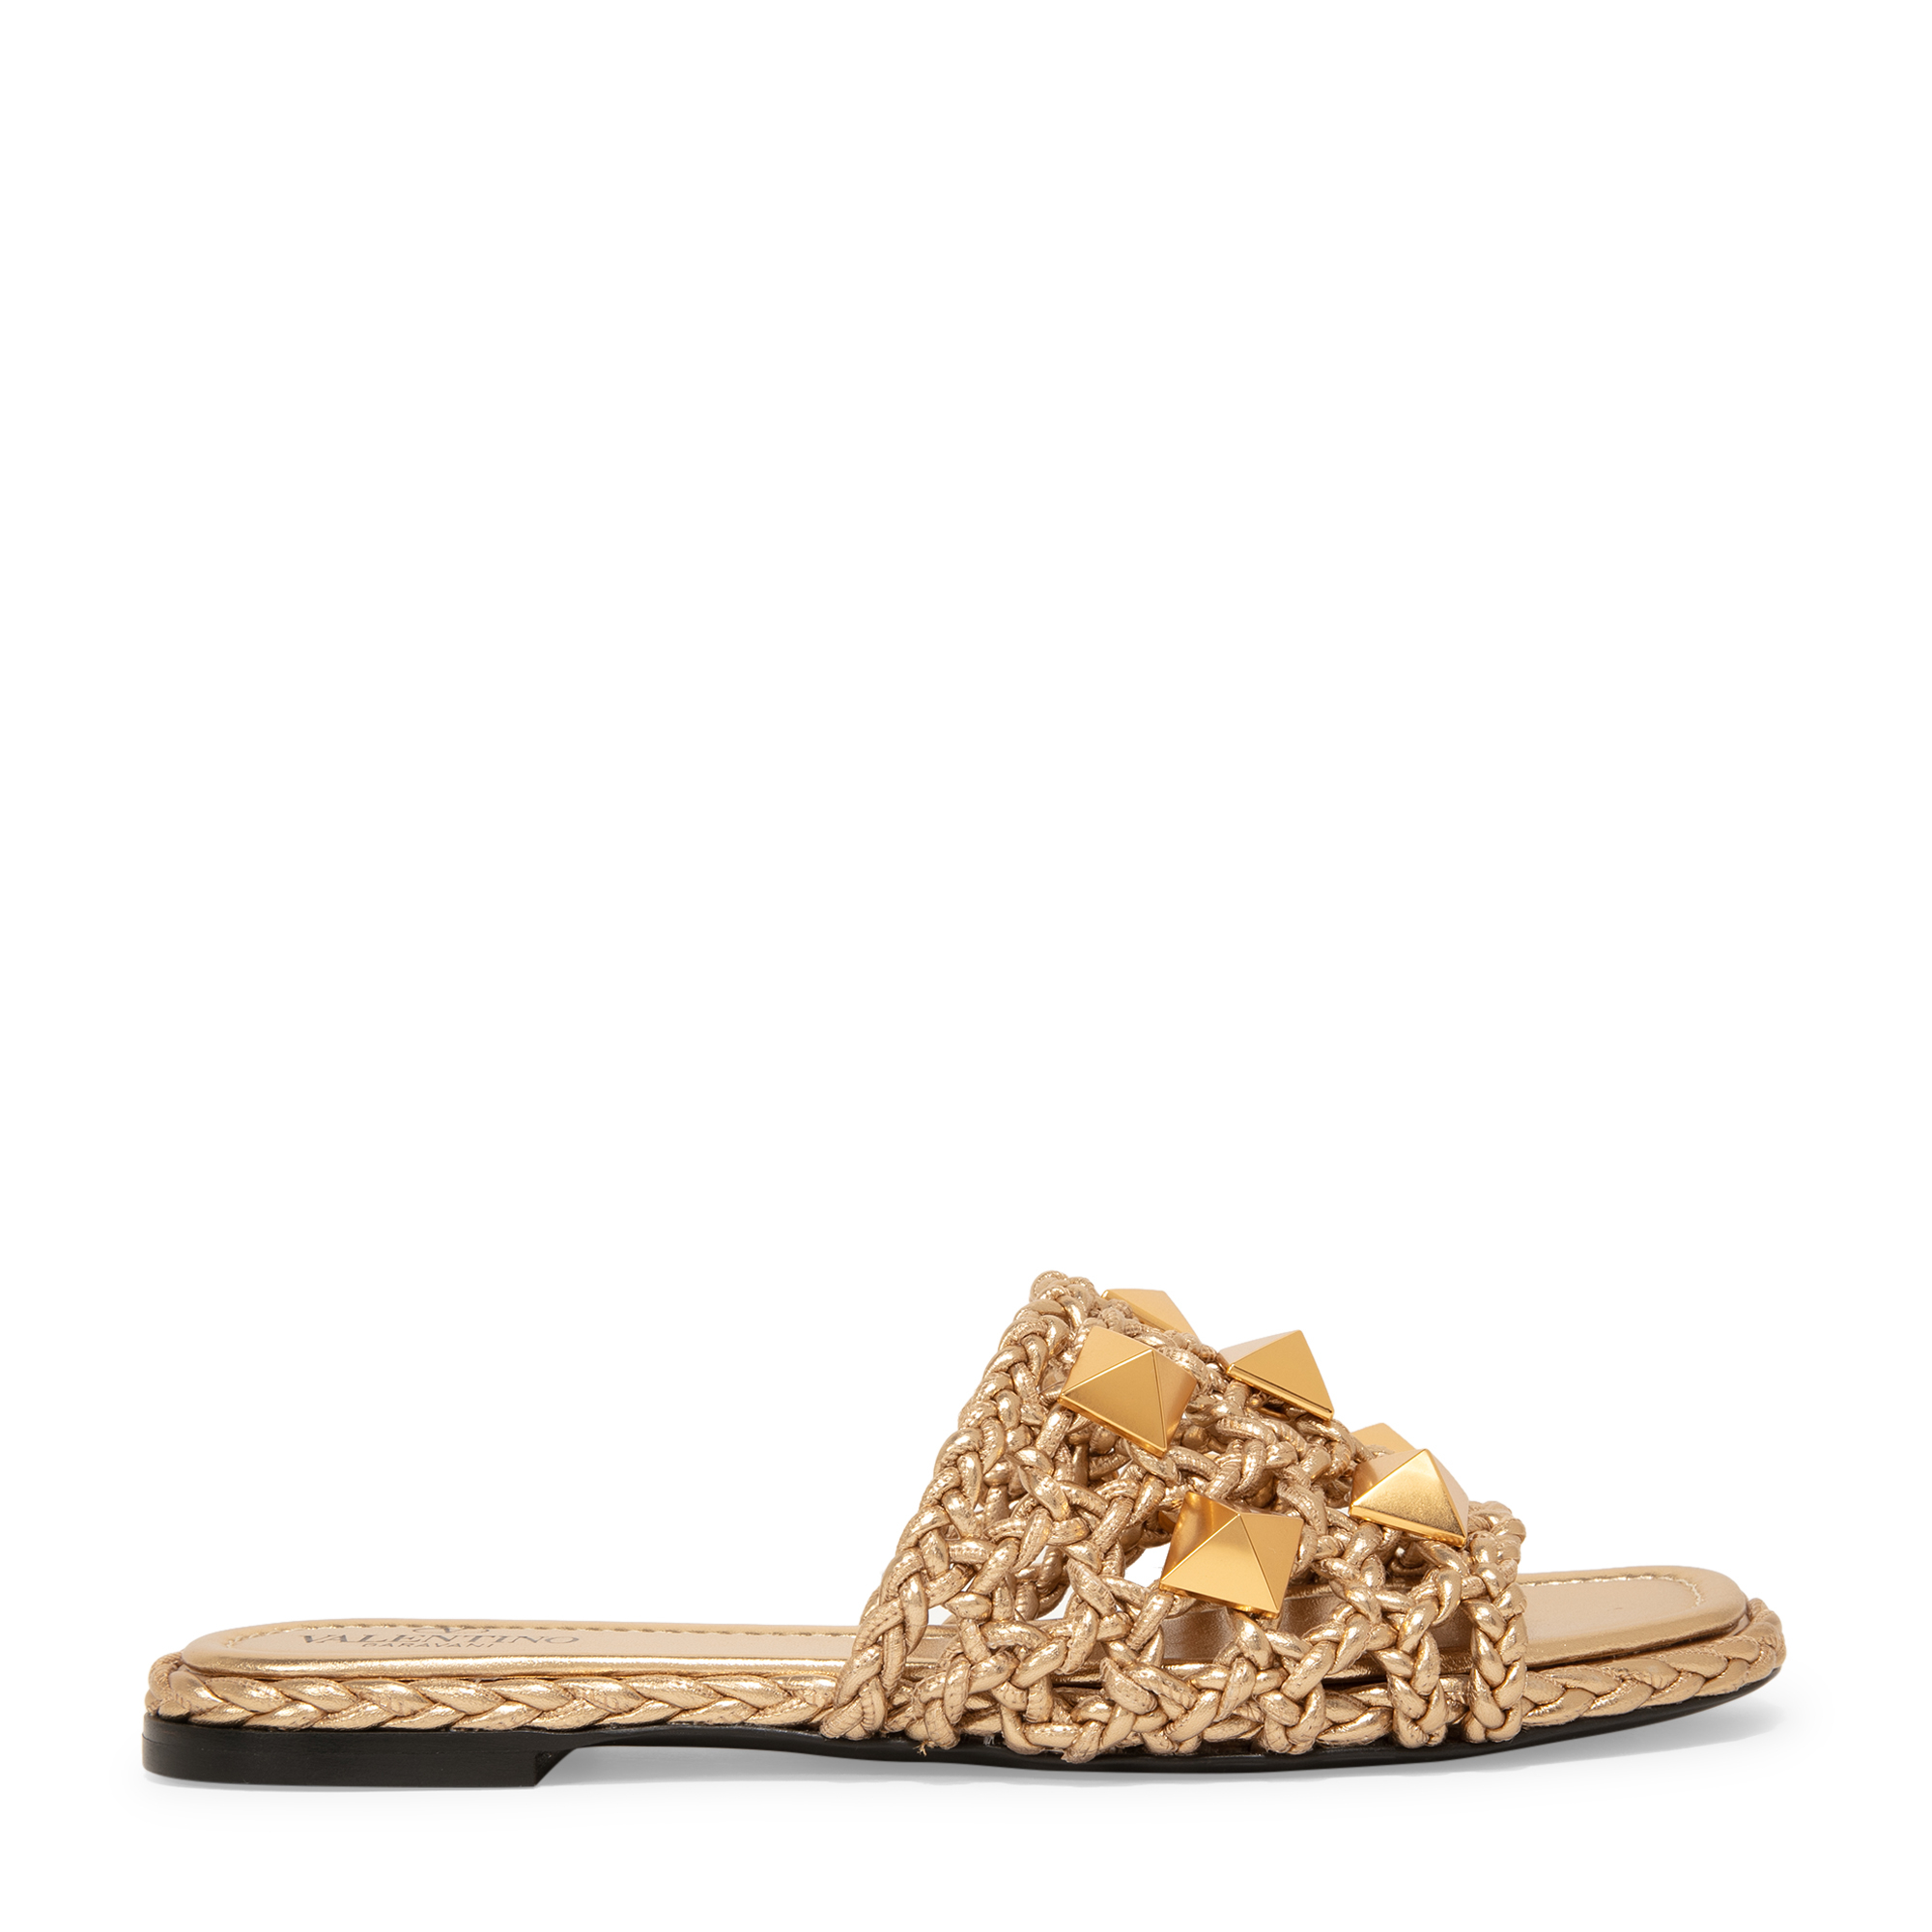 Roman Stud woven slide sandals